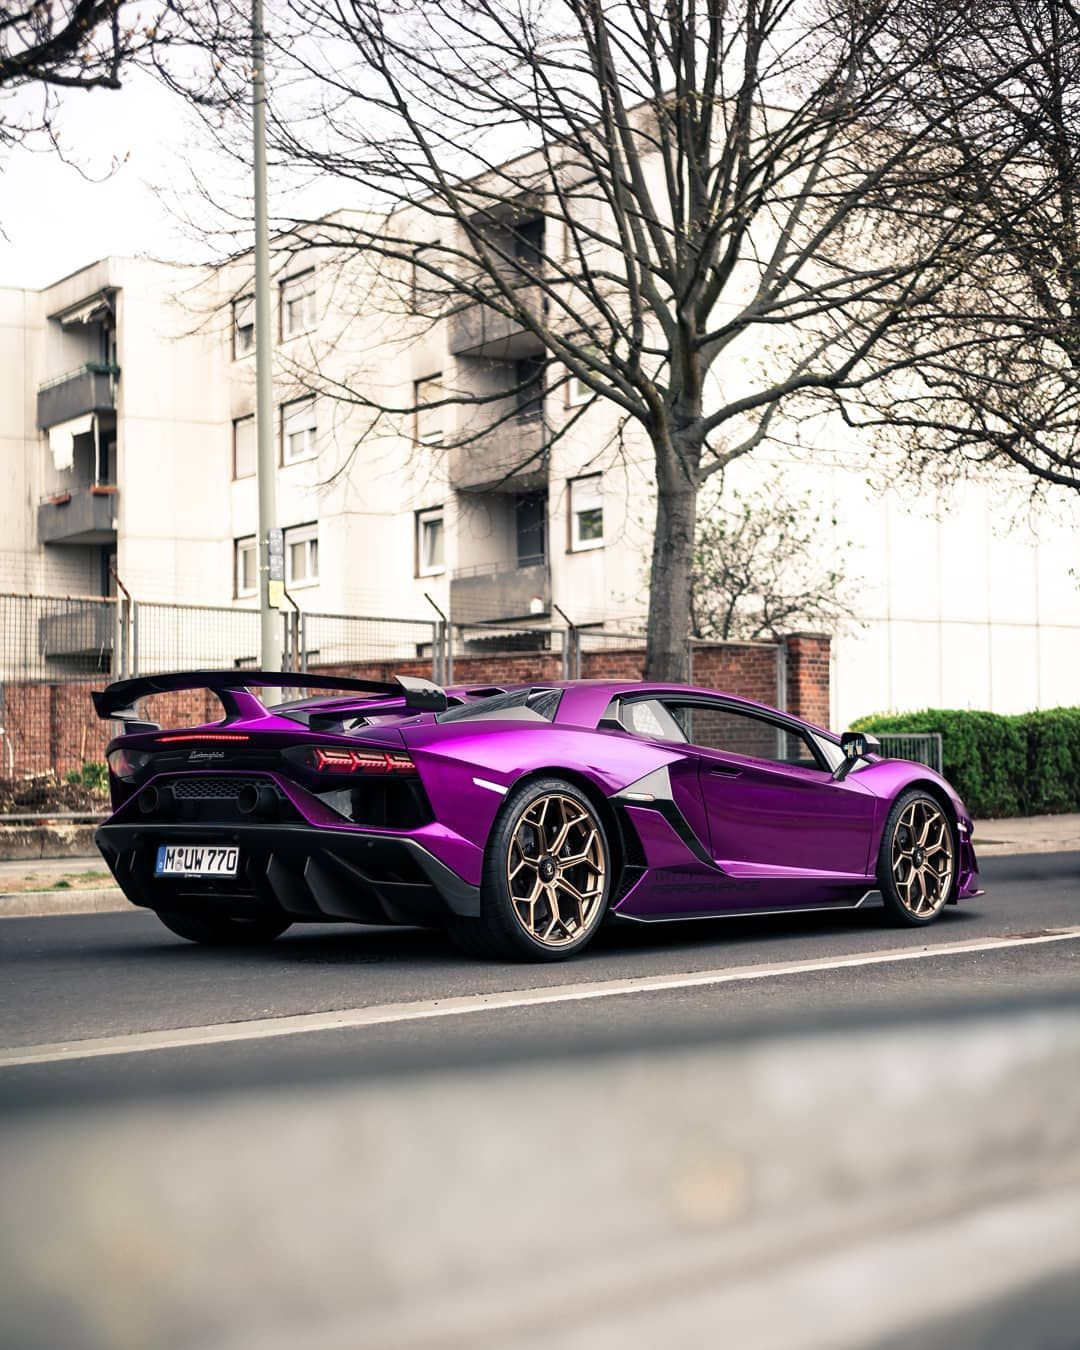 Its a wrap #Lamborghini #Lambo #Aventador #SV #J #Coupe #V12 #Purple #Wrap #Gold #Frankfurt #Main  Its a wrap #Lamborghini #Lambo #Aventador #SV #J #Coupe #V12 #Purple #Wrap #Gold #Frankfurt #Main #FFM #2019 #Amazingcars247 #Amazing_cars #Carswithoutlimits #Cargram #Car #Carinstagram #Carporn #Blacklist #Instapic #Instacar #Lifestyle #Luxury #Racecar #Supercar #Carbon #Itswhitenoise #lamborghinisv Its a wrap #Lamborghini #Lambo #Aventador #SV #J #Coupe #V12 #Purple #Wrap #Gold #Frankfurt #Main #lamborghinisv